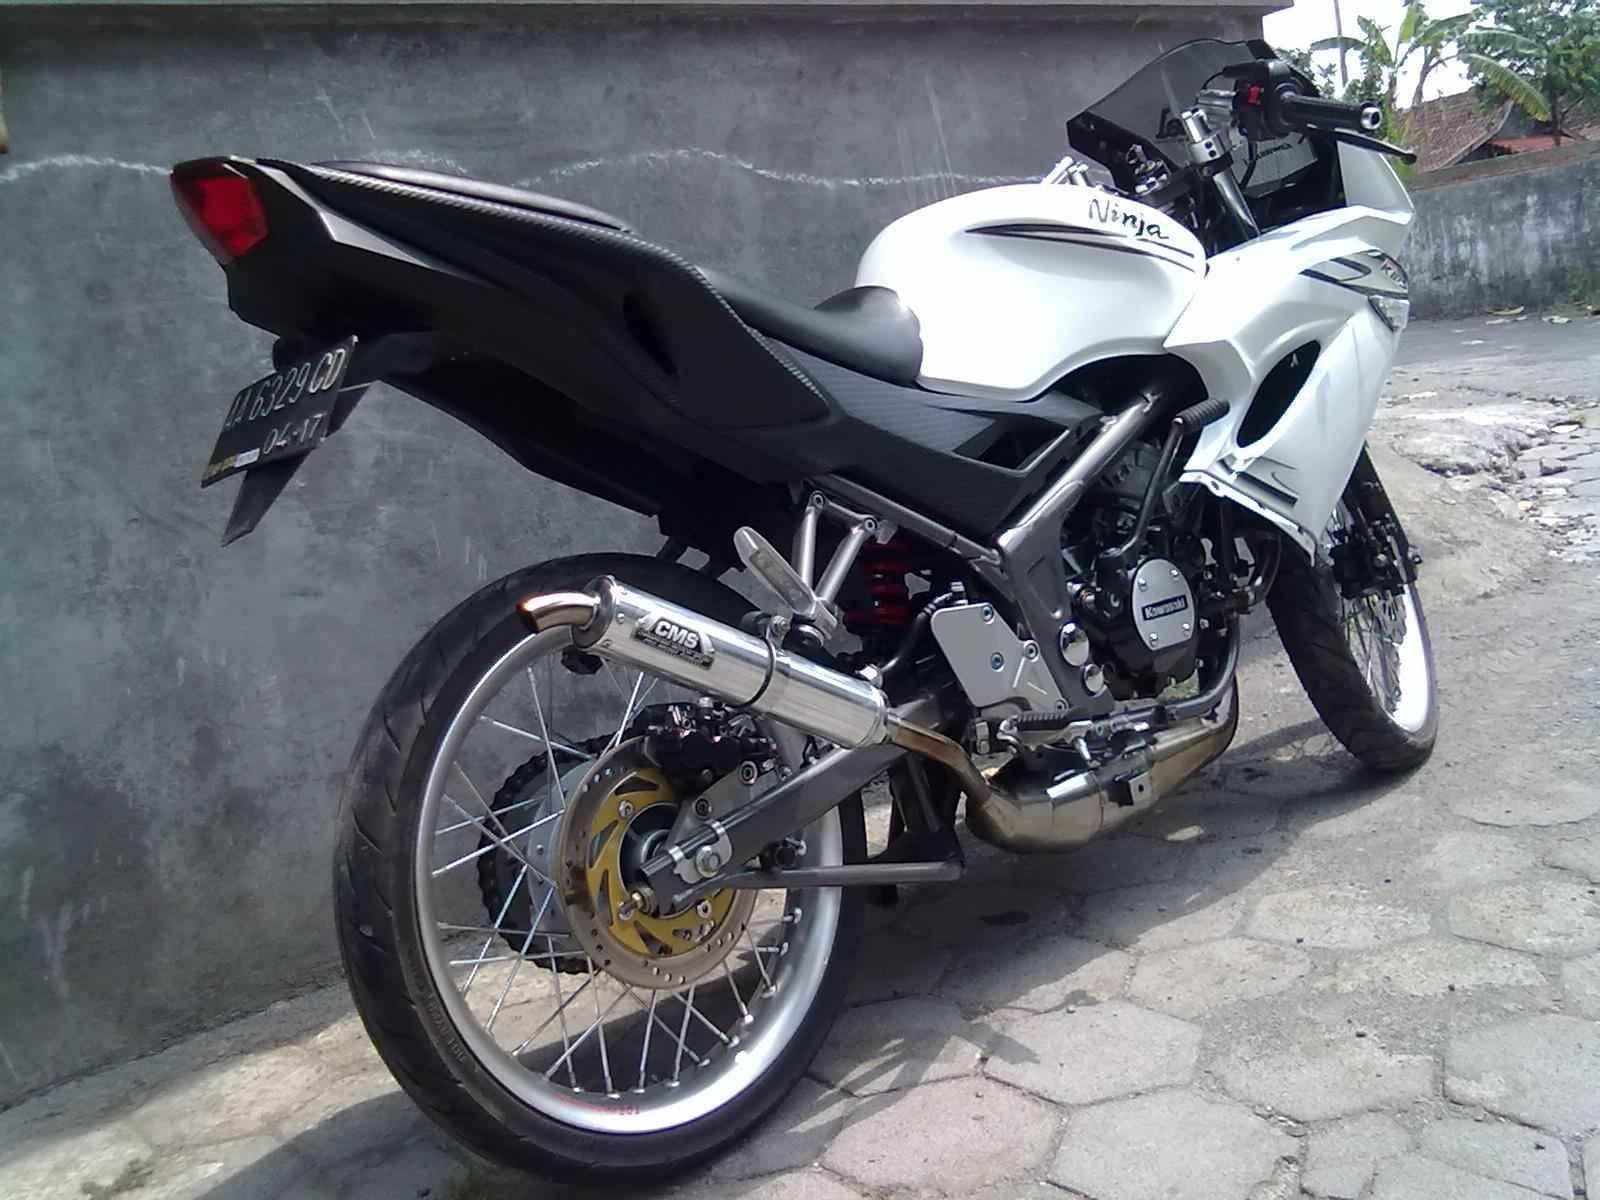 Modif Kawasaki Ninja 150 Rr Velg 17 Jari Jari Modifikasi Motor